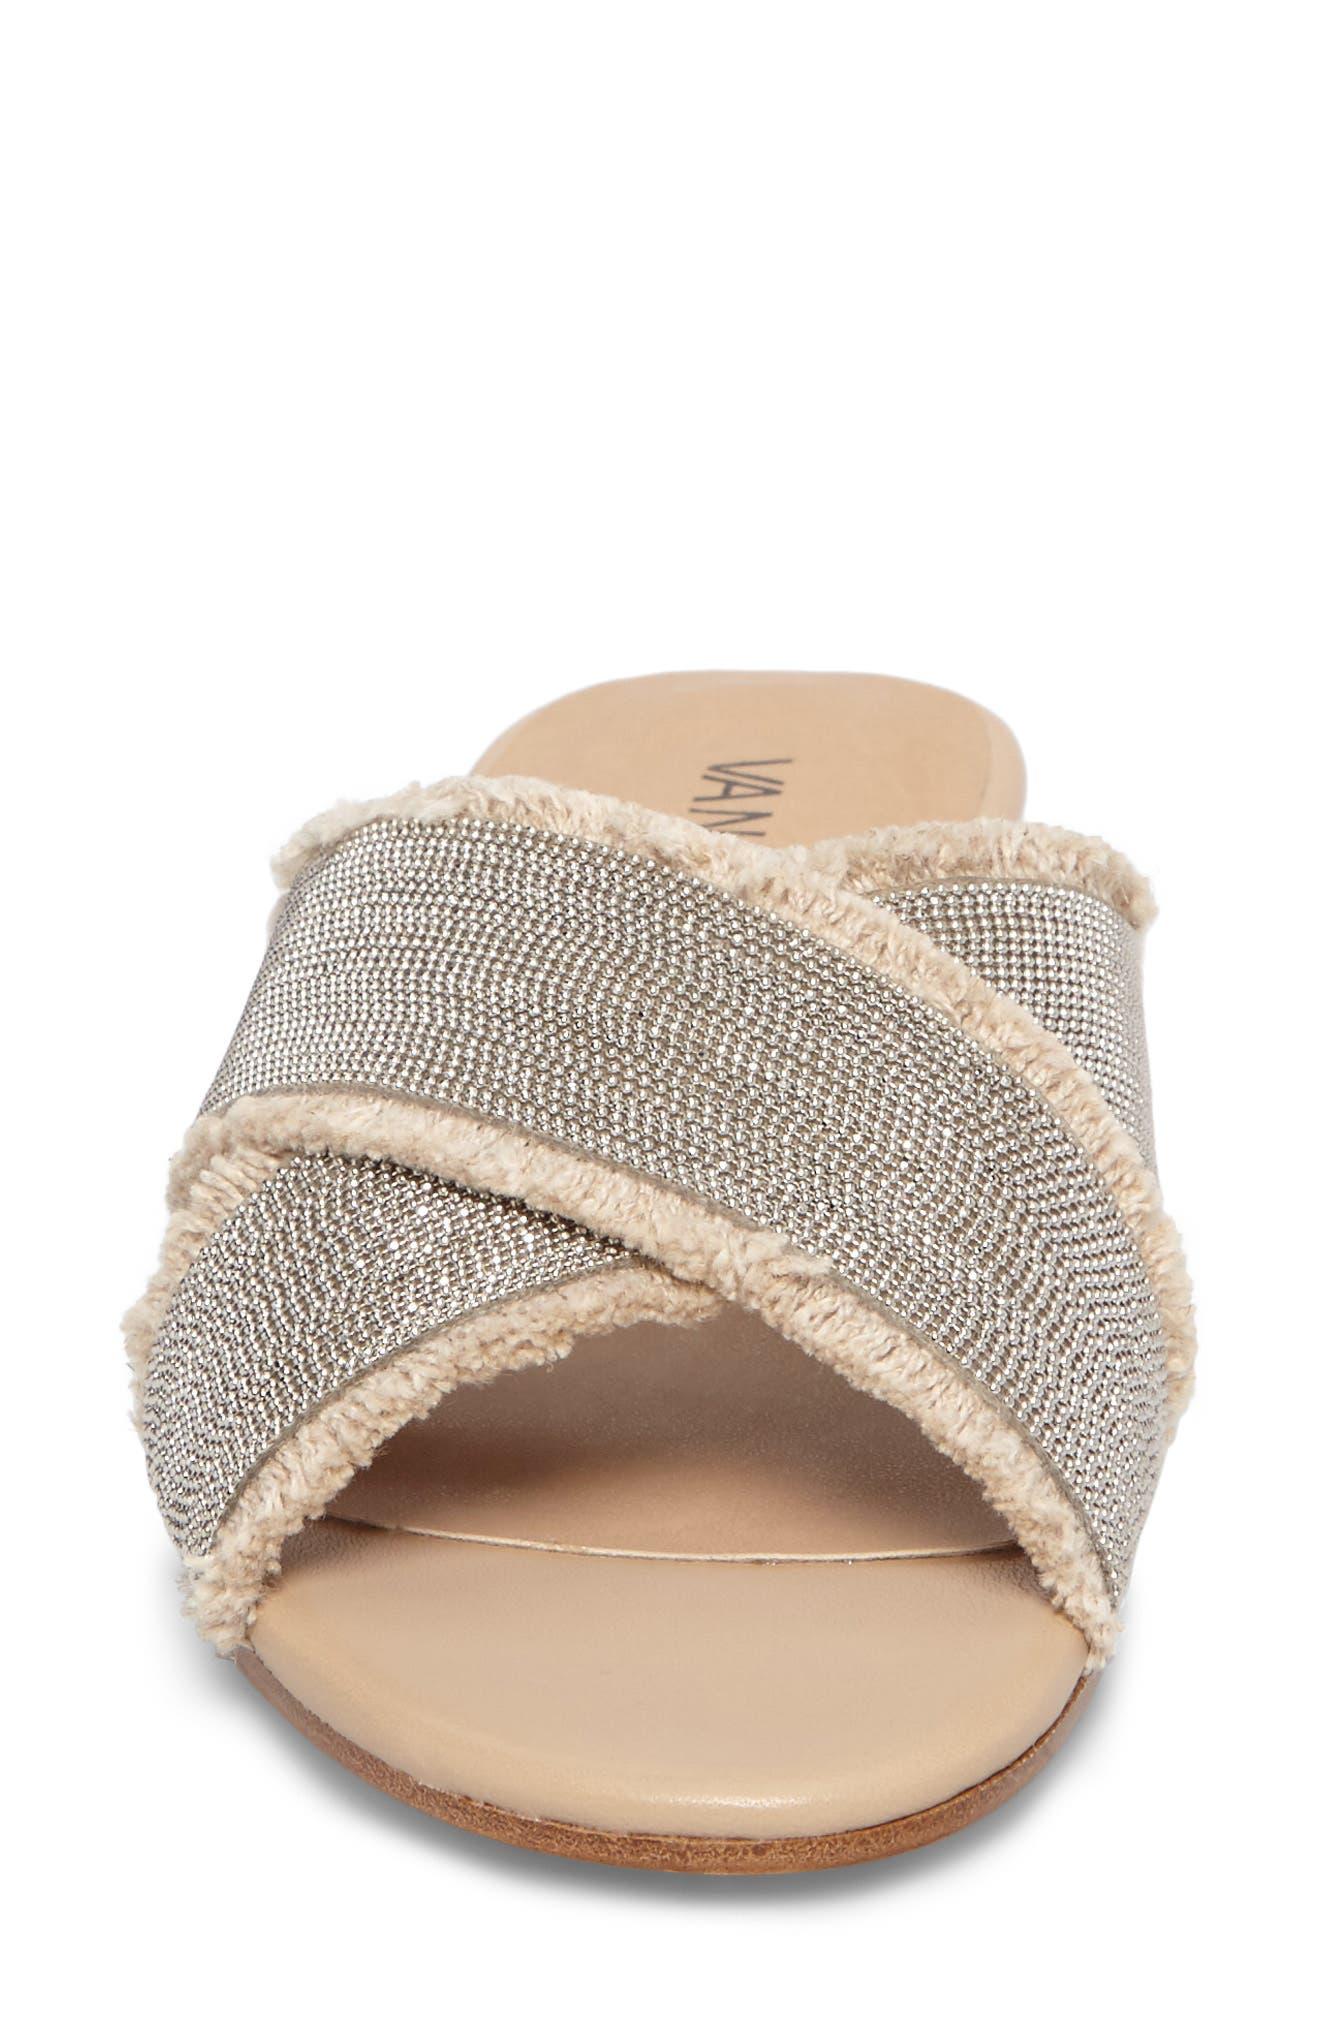 Baret Slide Sandal,                             Alternate thumbnail 4, color,                             Natural Fabric